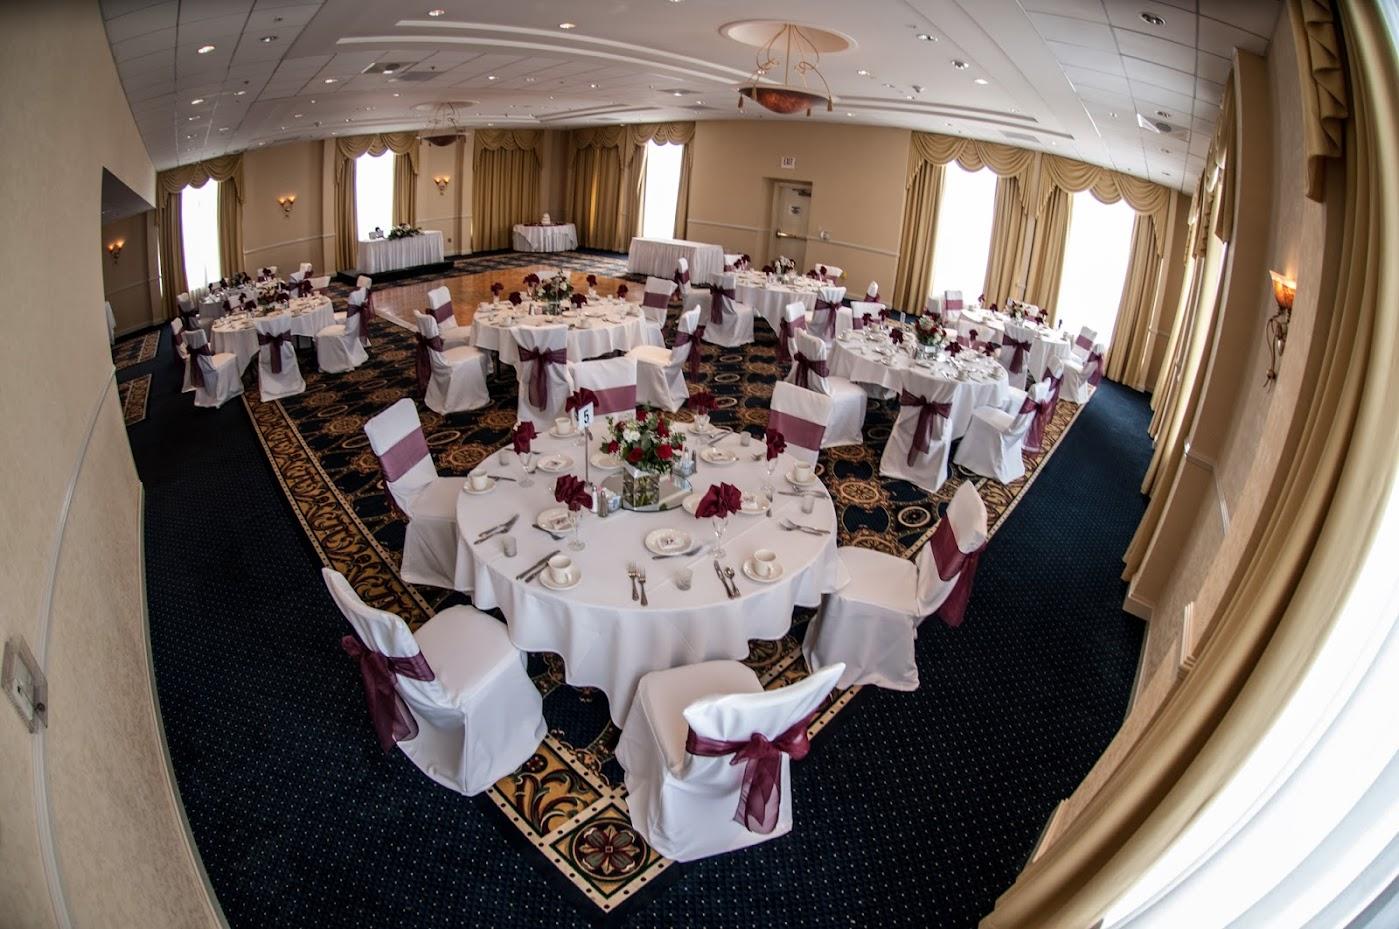 Banquet room, Knotts Berry Farm Hotel